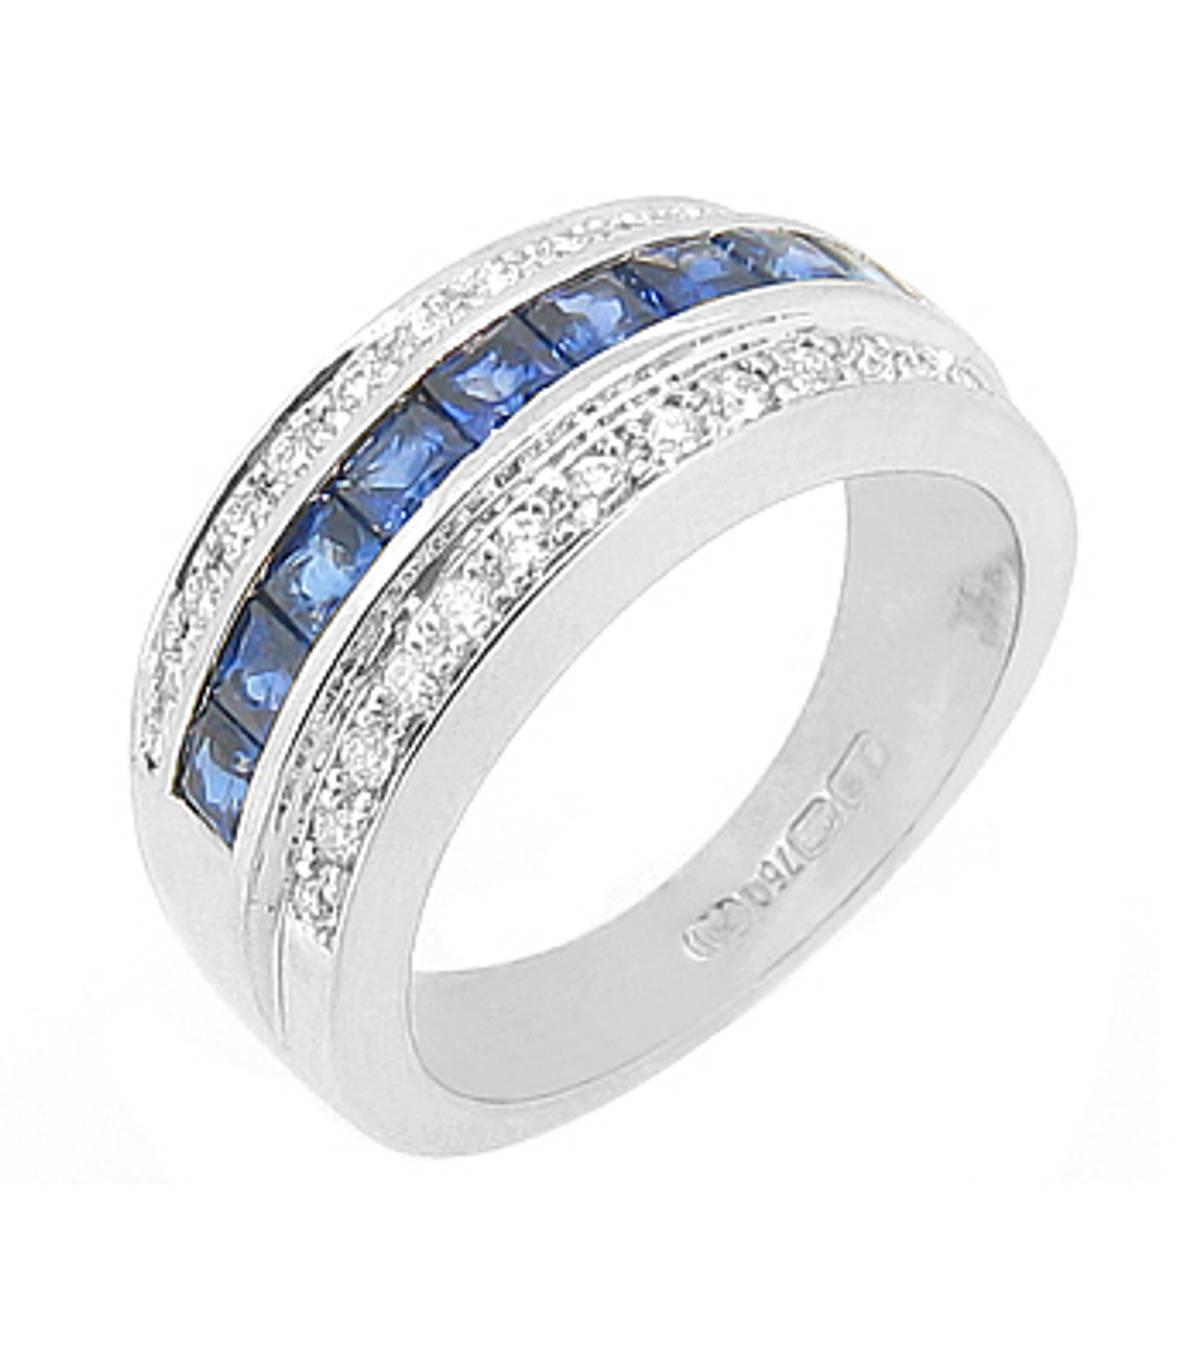 3 ROW SAPPHIRE AND DIAMOND RING